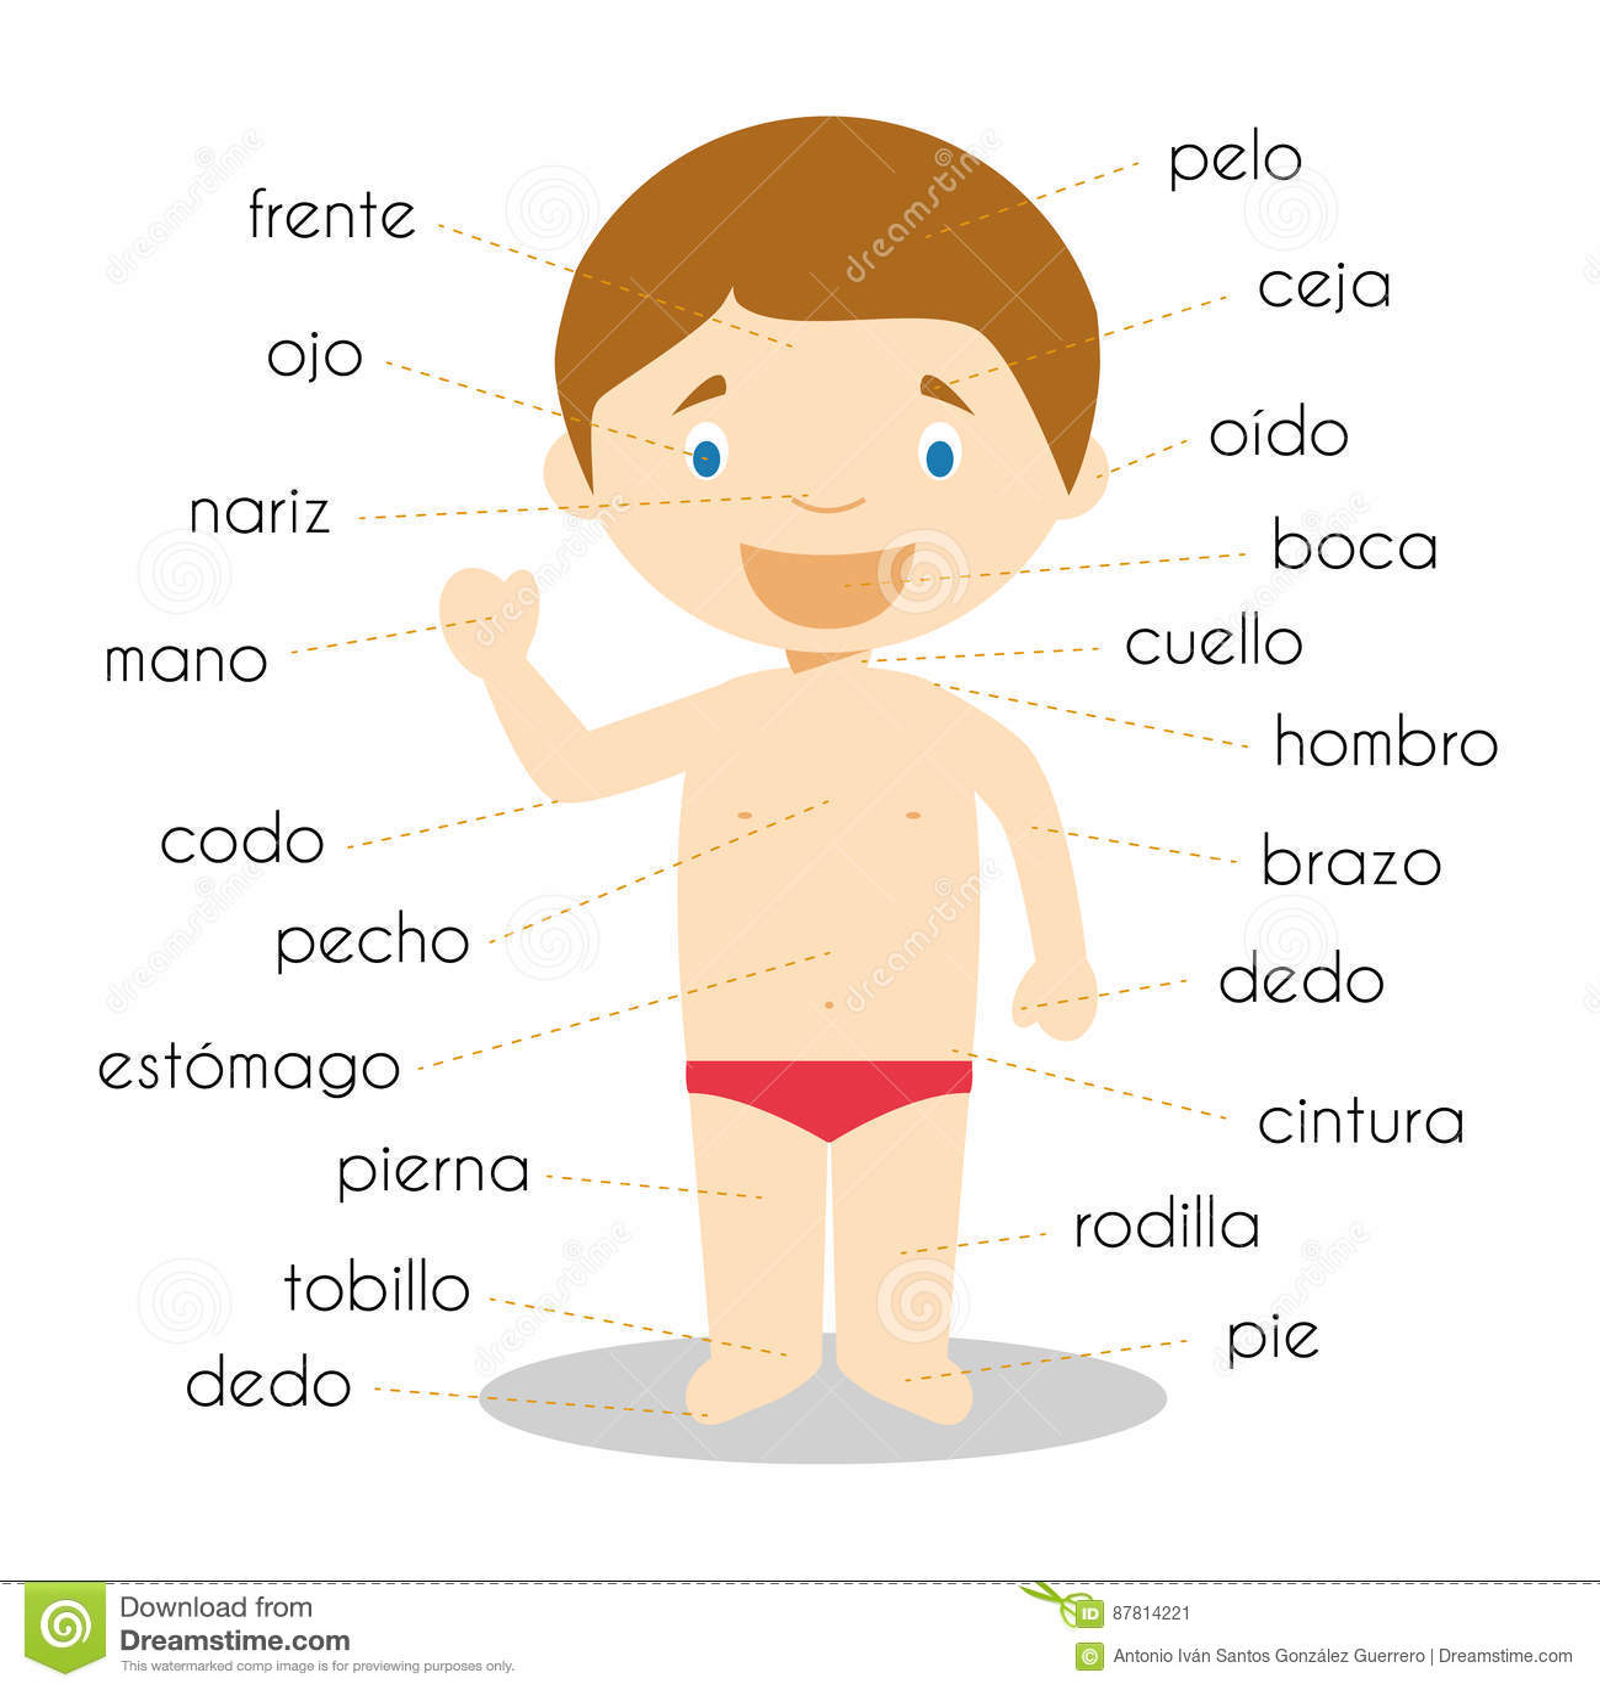 Spanish anatomy terms